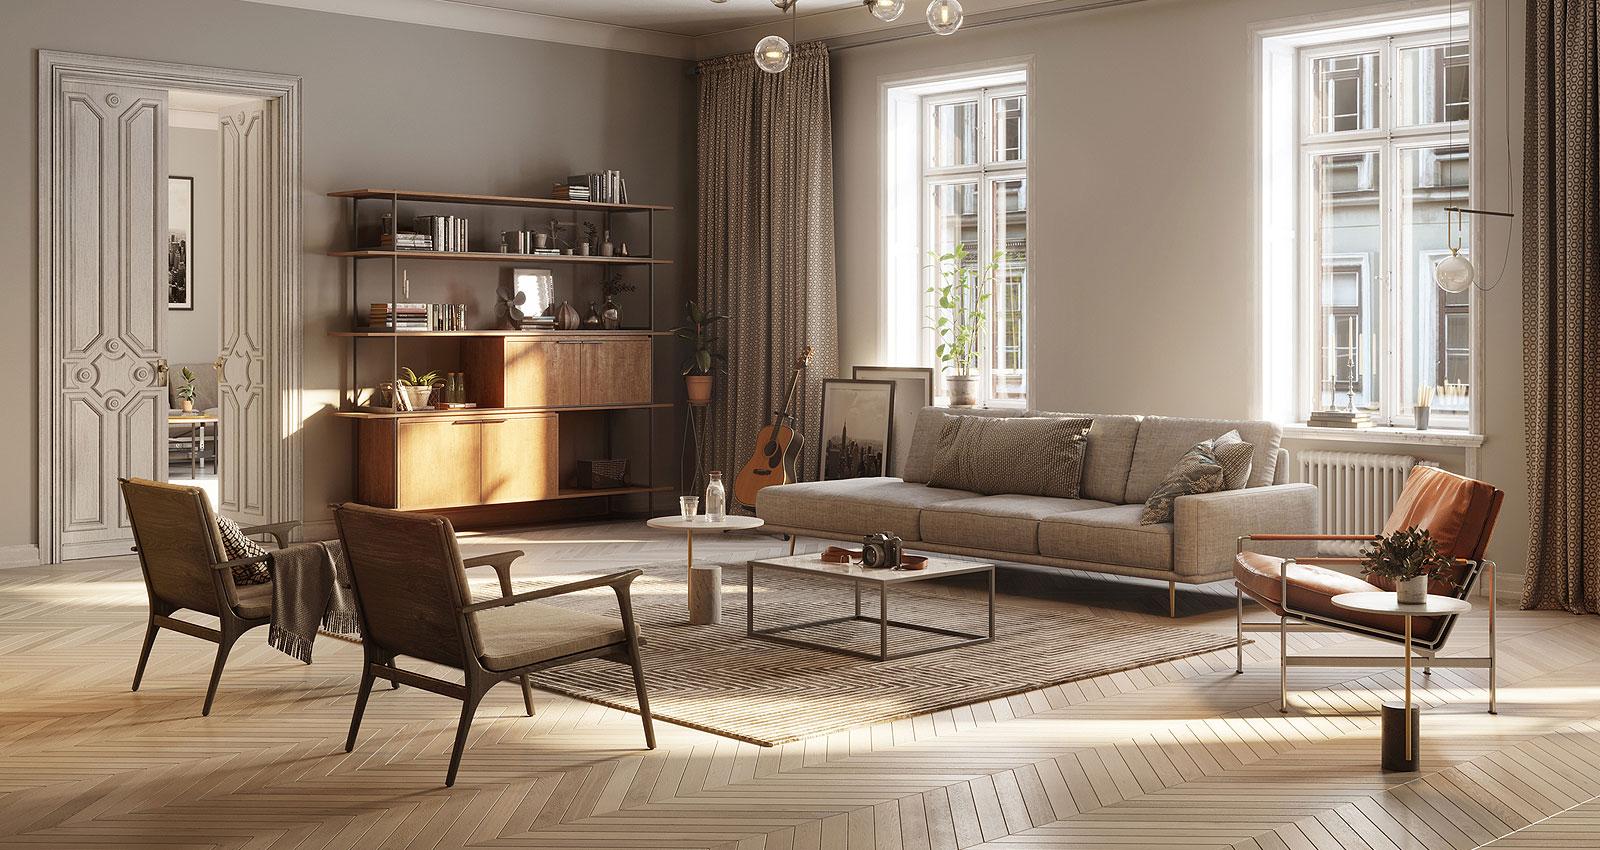 classy and elegant living room